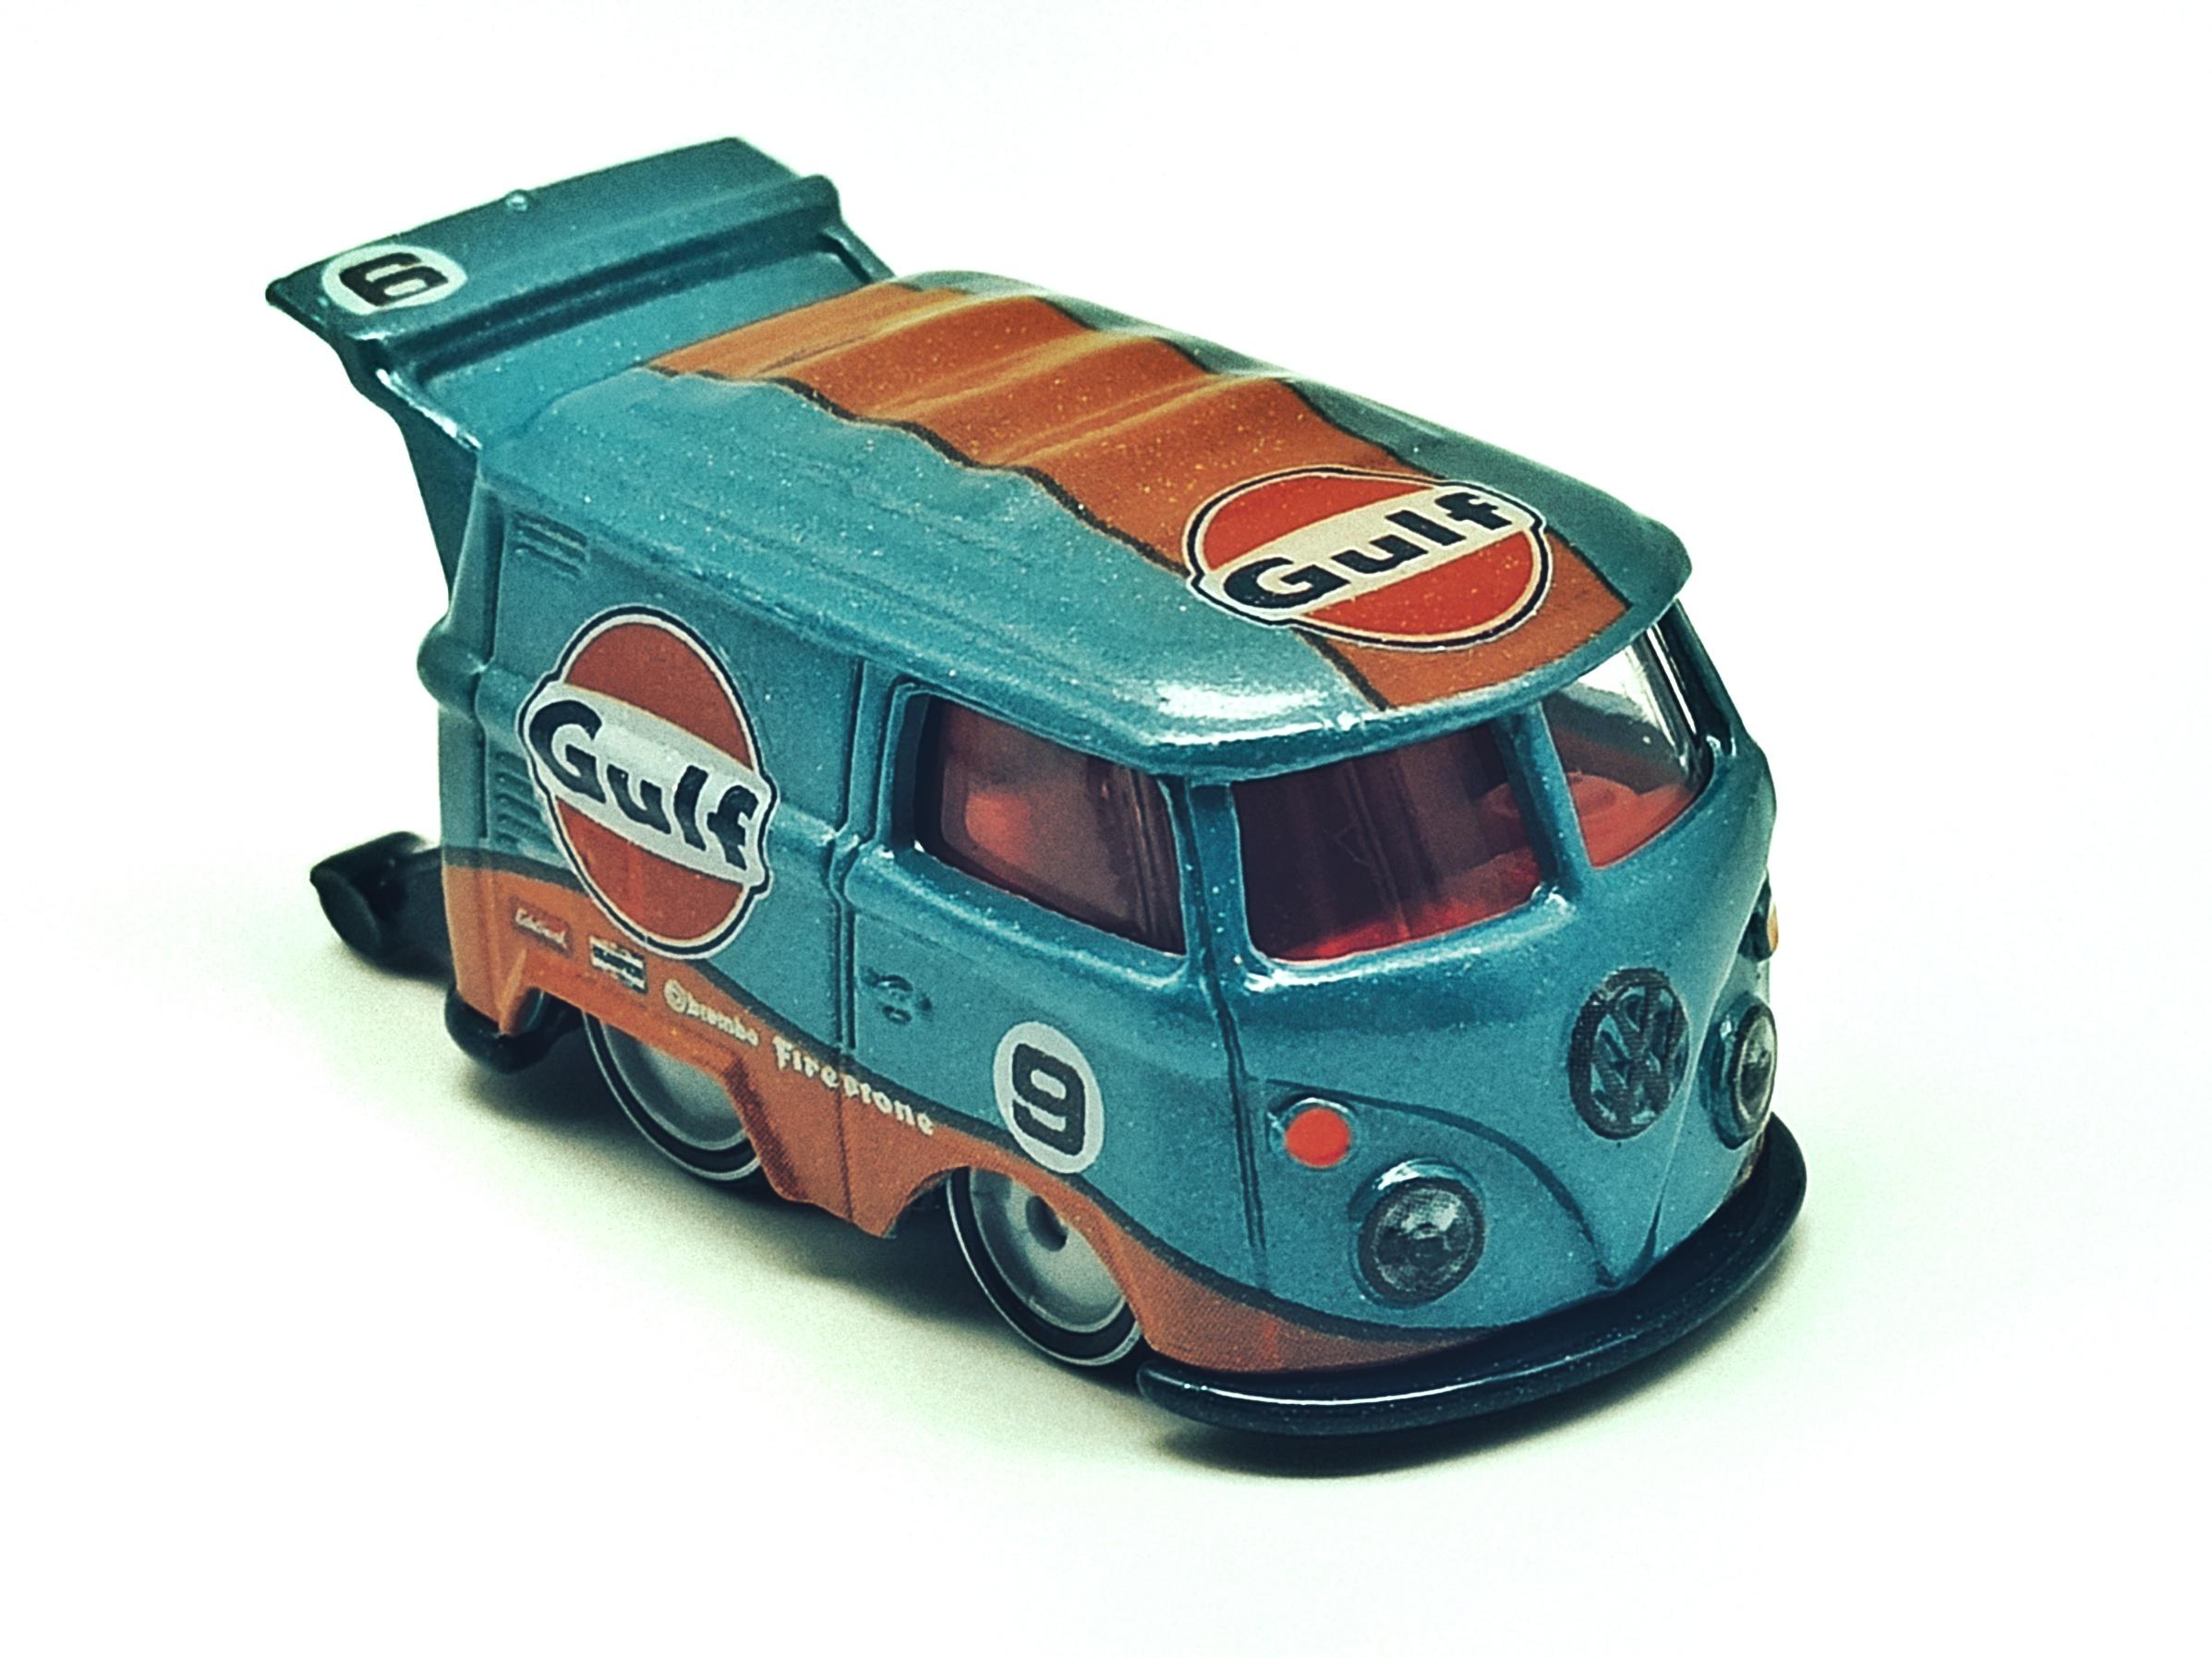 Hot Wheels Volkswagen Kool Kombi spectraflame light blue (Gulf) Custom VW top angle